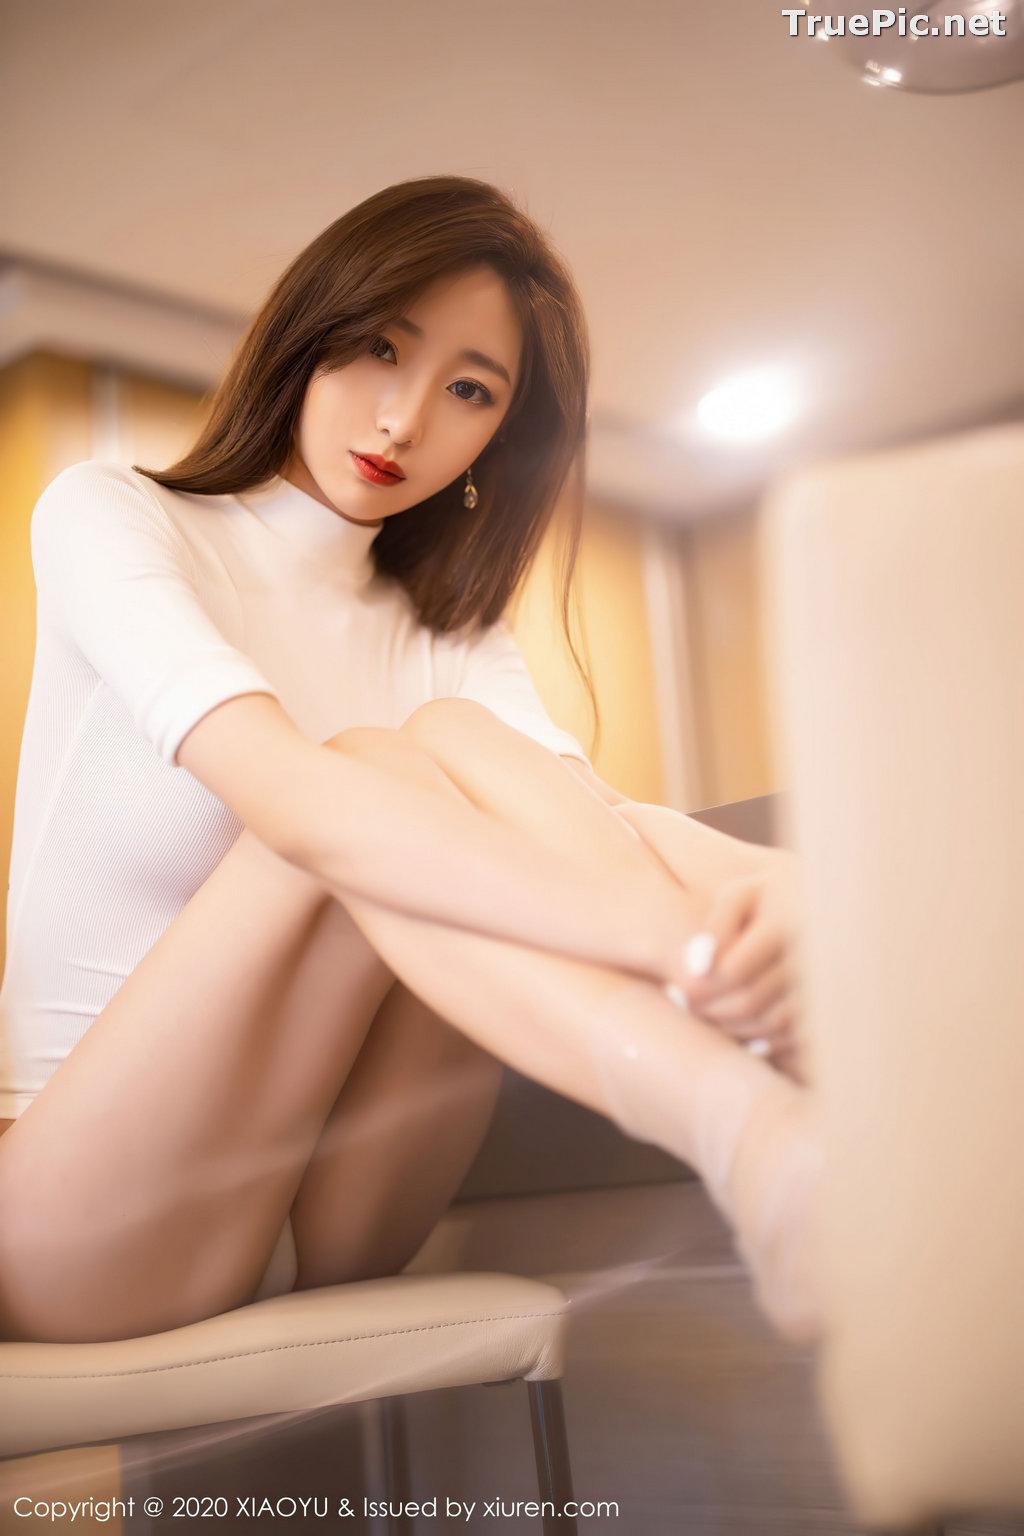 Image XiaoYu Vol.389 - Chinese Model - 安琪 Yee - Beautiful In White - TruePic.net - Picture-8